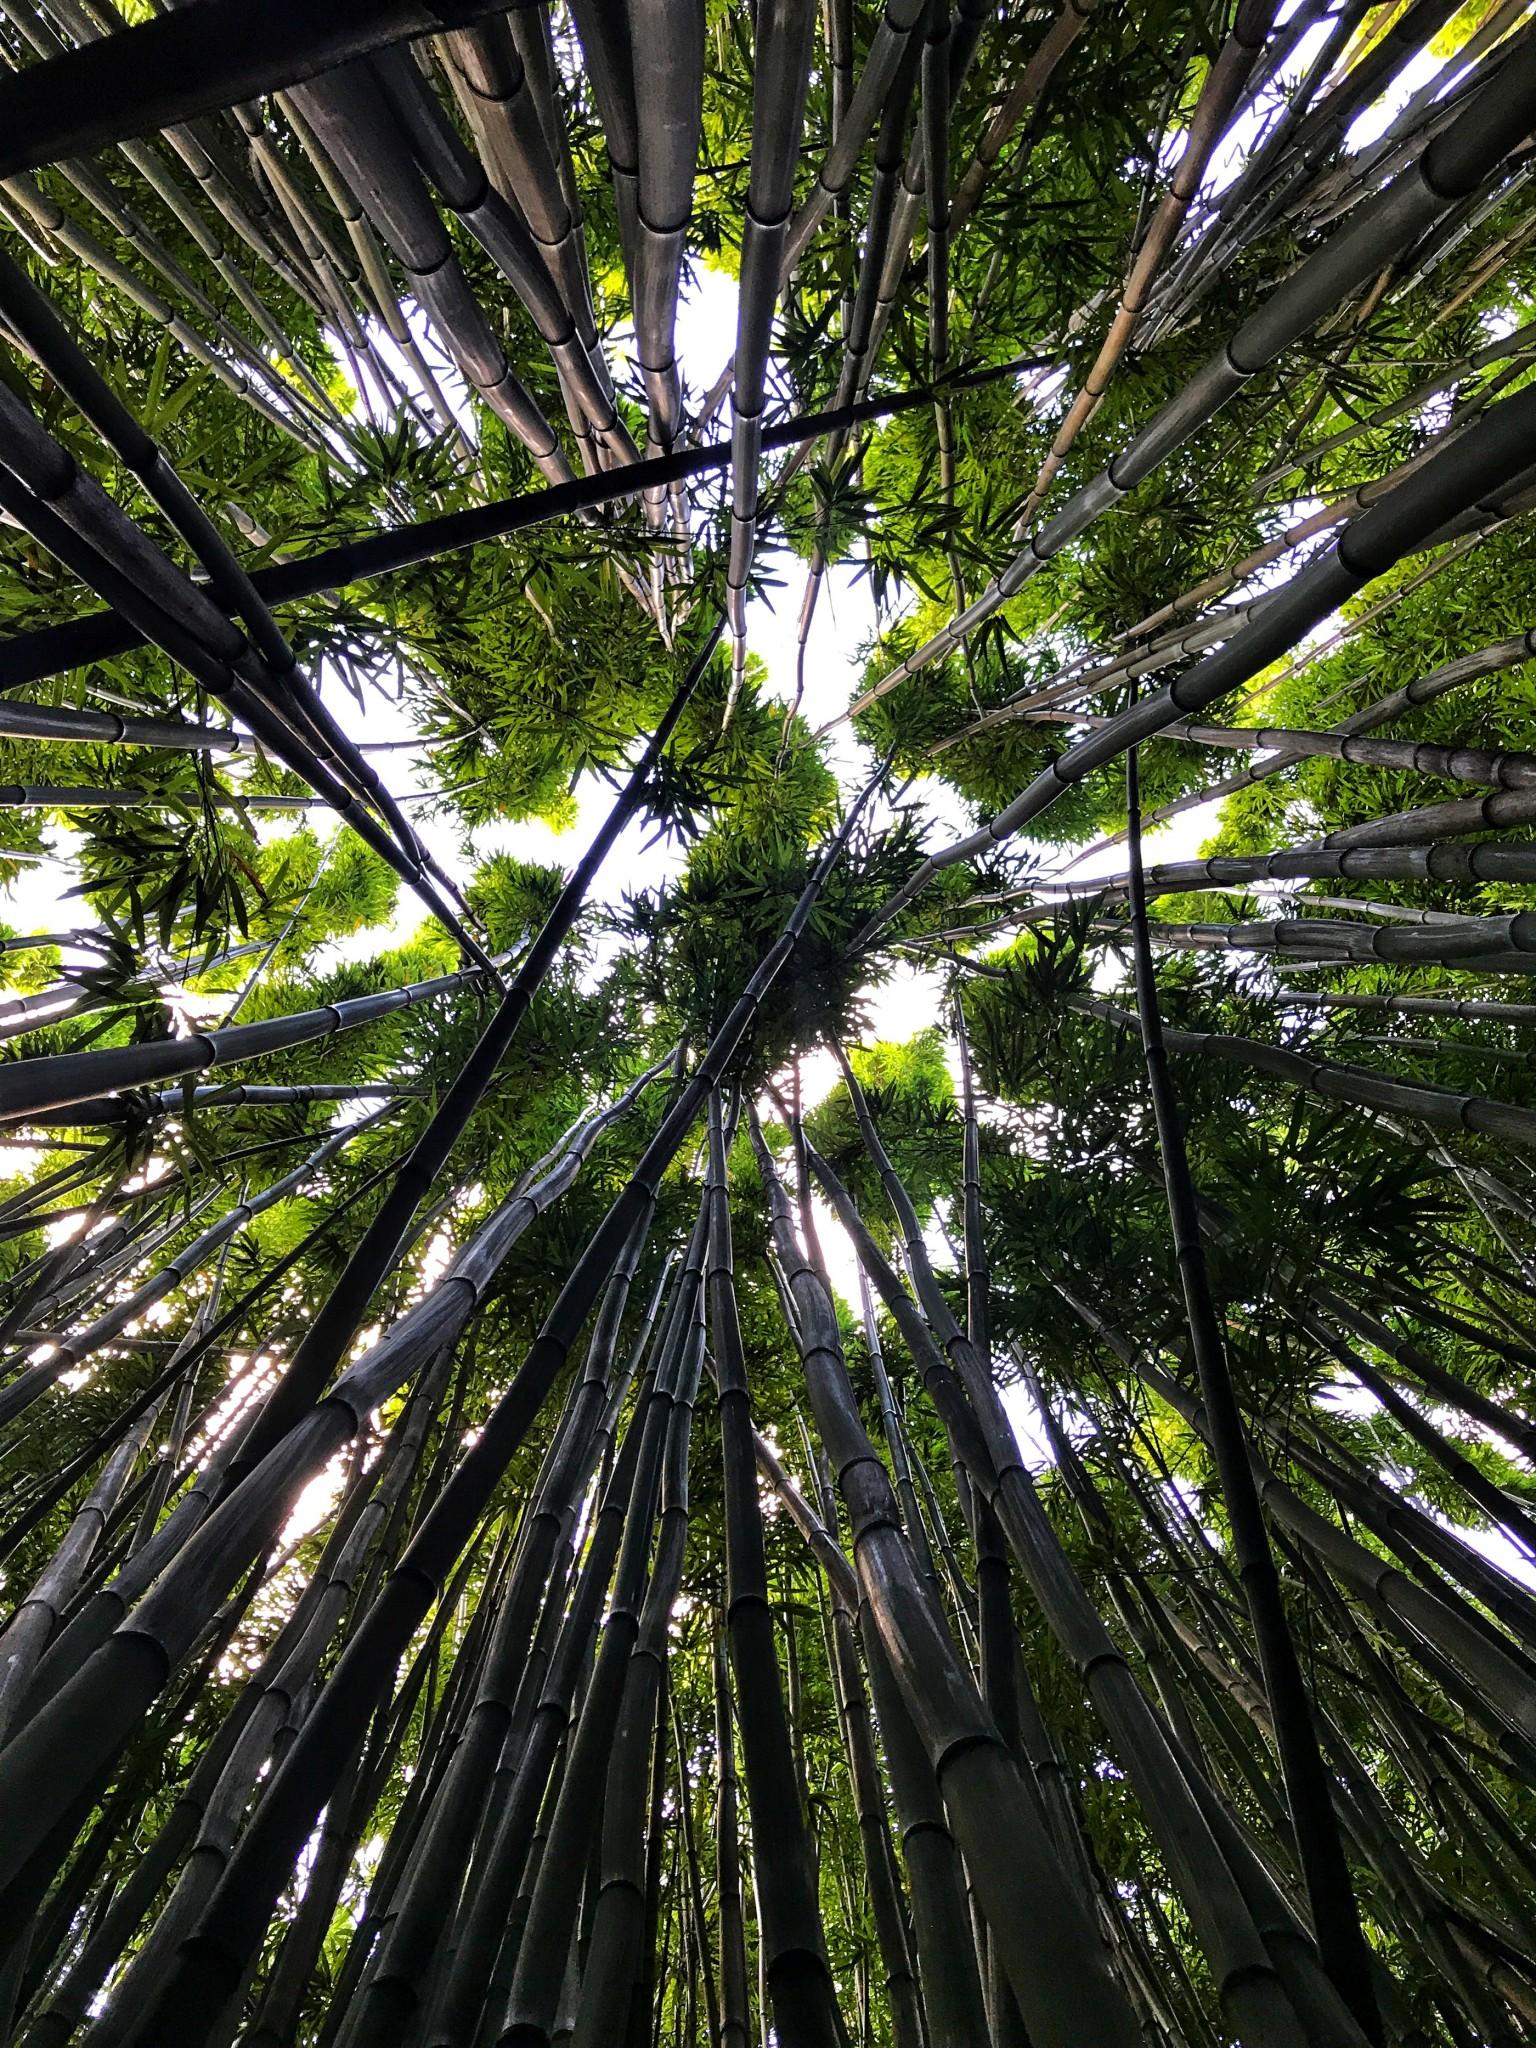 bamboo forest, road to hana, haleakala national park, the-alyst.com